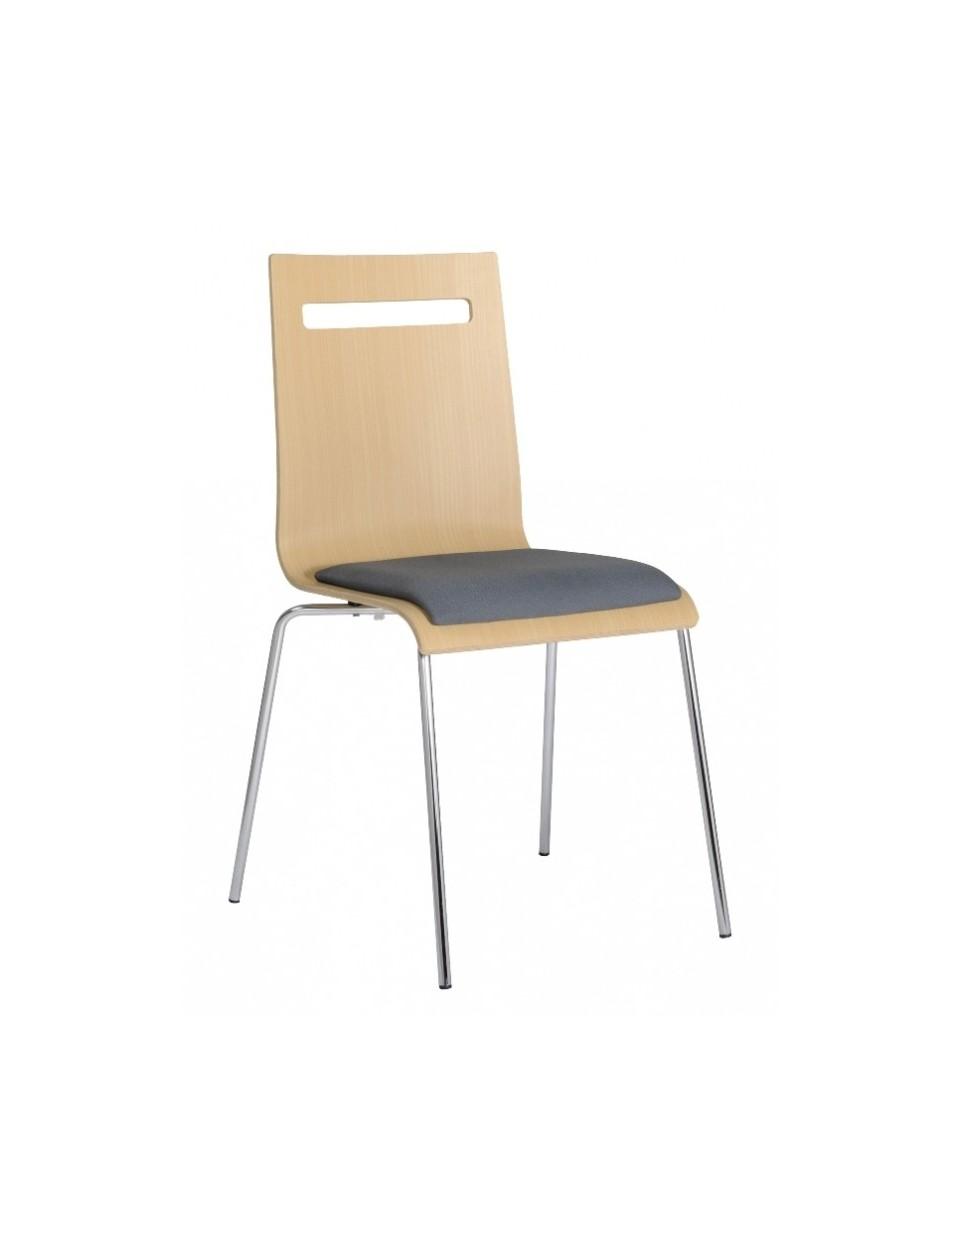 ugostiteljska-stolica-elsi-tc